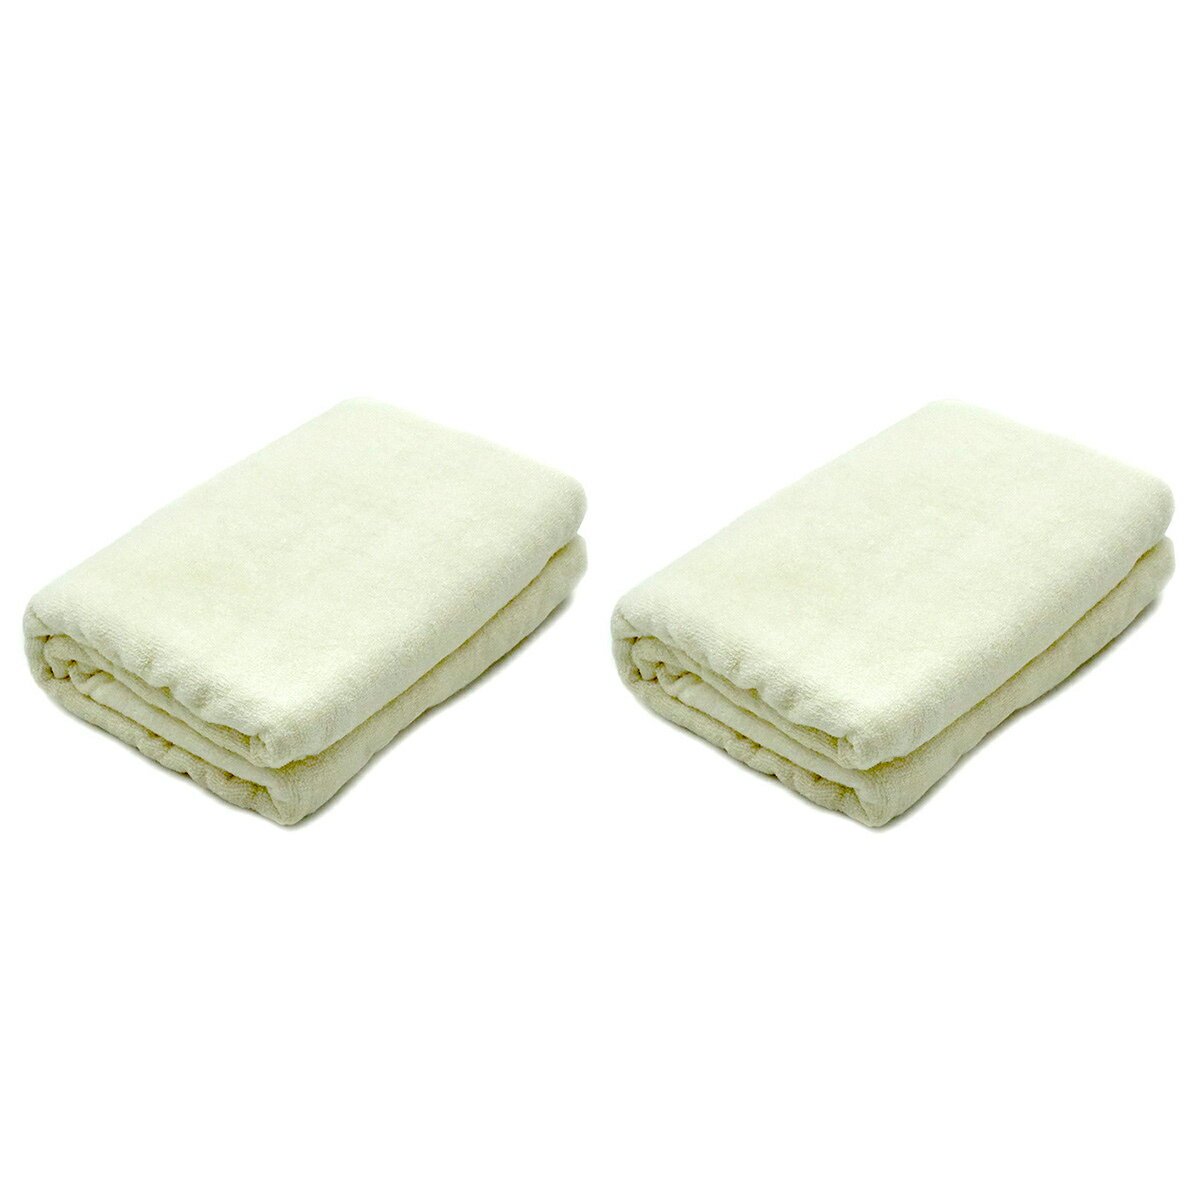 TAKEFU バスタオル ナチュラル 2枚セット (竹布 タオル) 【 TAKEFU 竹布 抗菌 消臭 吸水 制電 タオル バスタオル 】